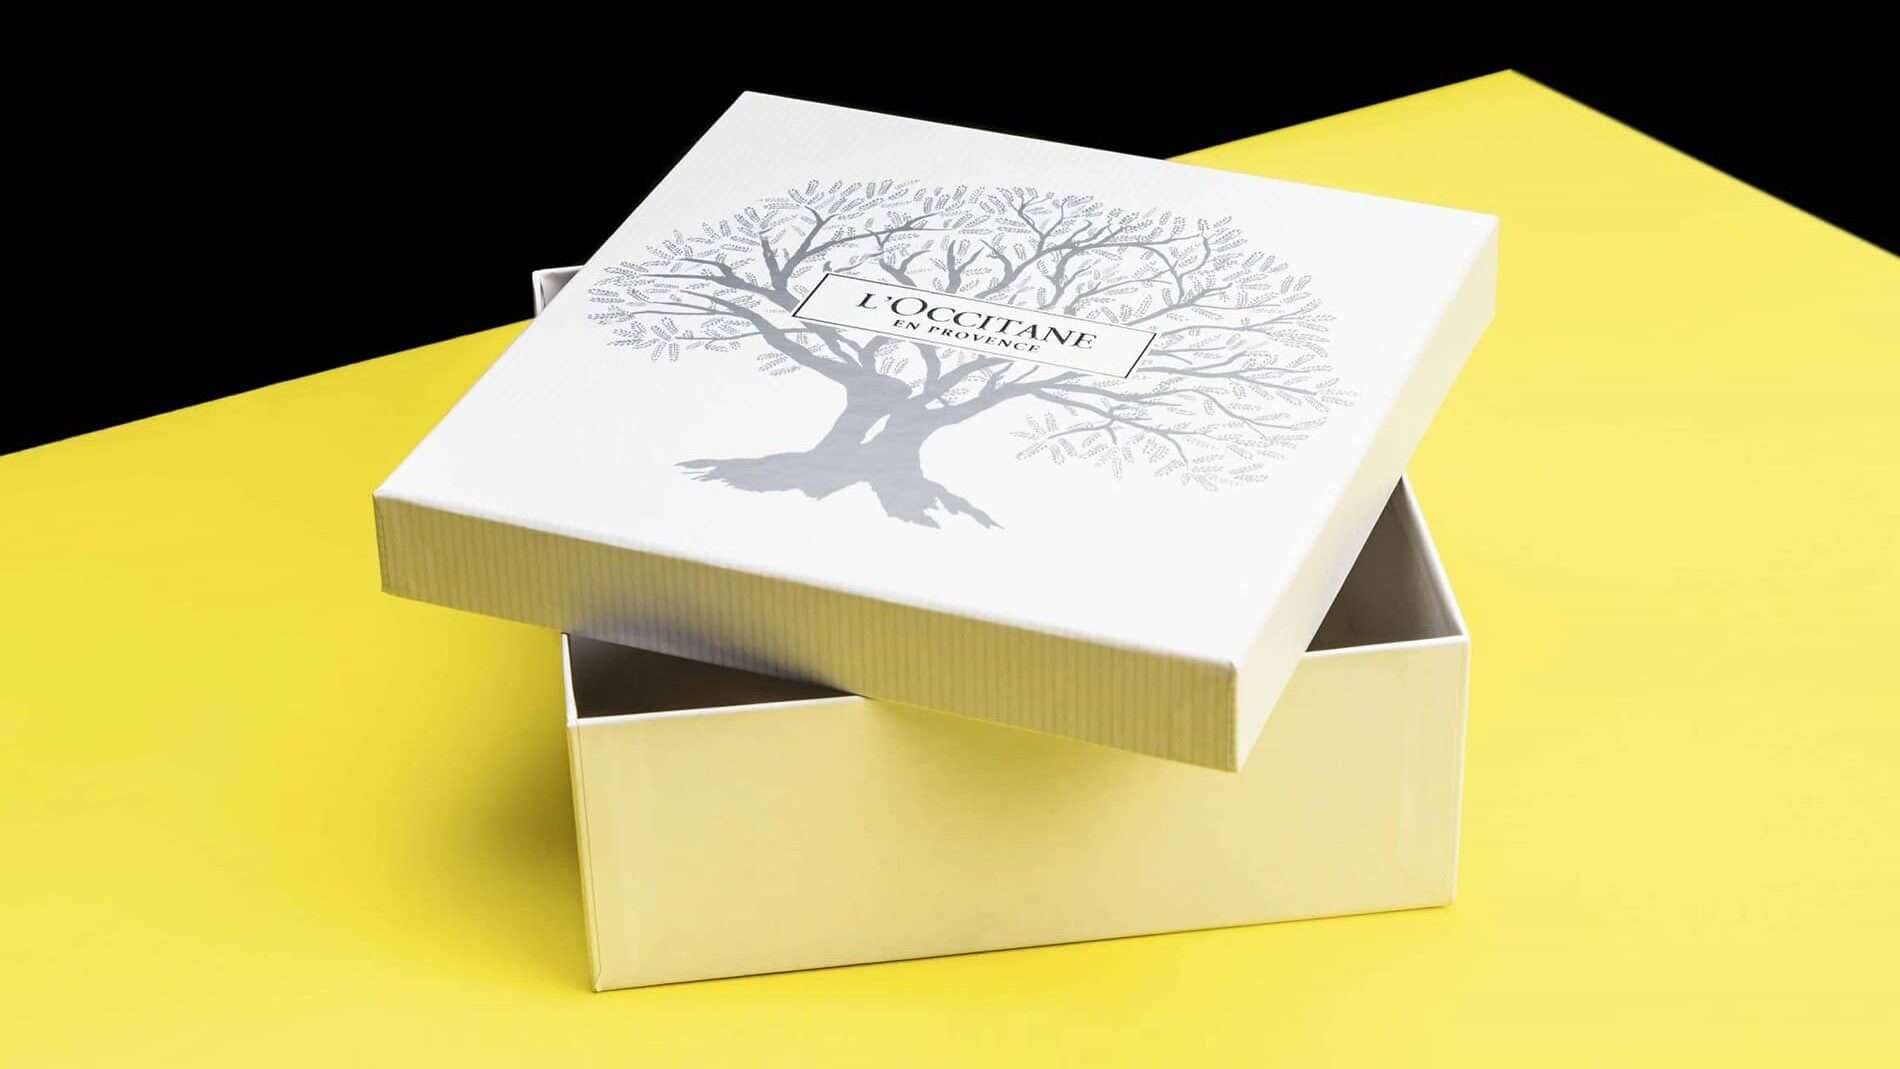 rigid box with lift off lid